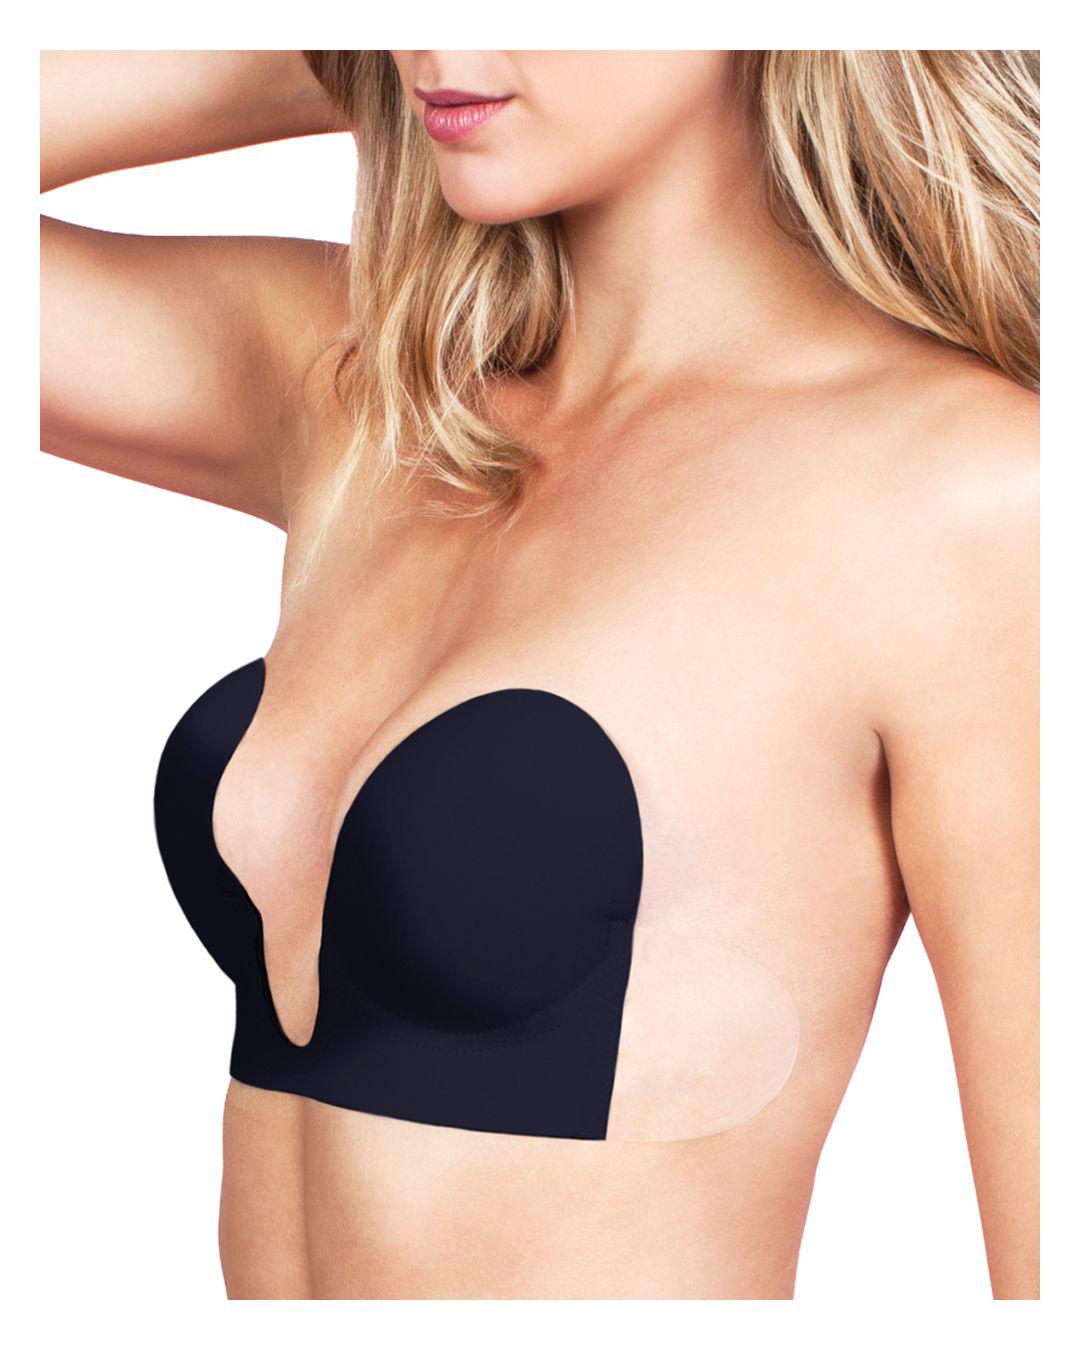 57291ac7fa6af Lyst - Fashion Forms Backless U-plunge Strapless Bra in Black